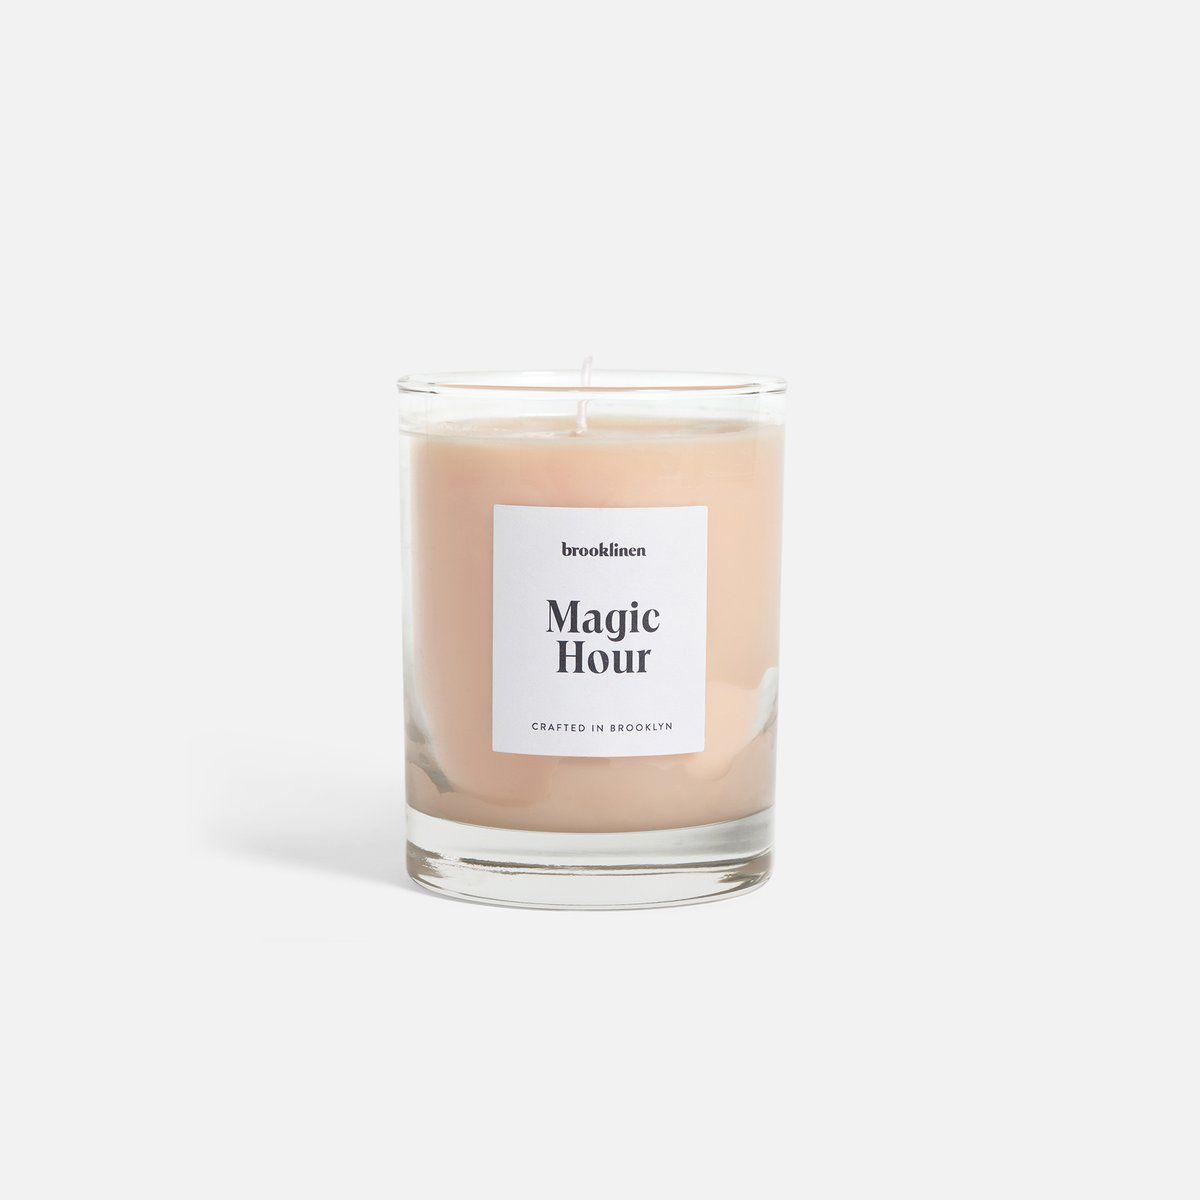 magic hour candle